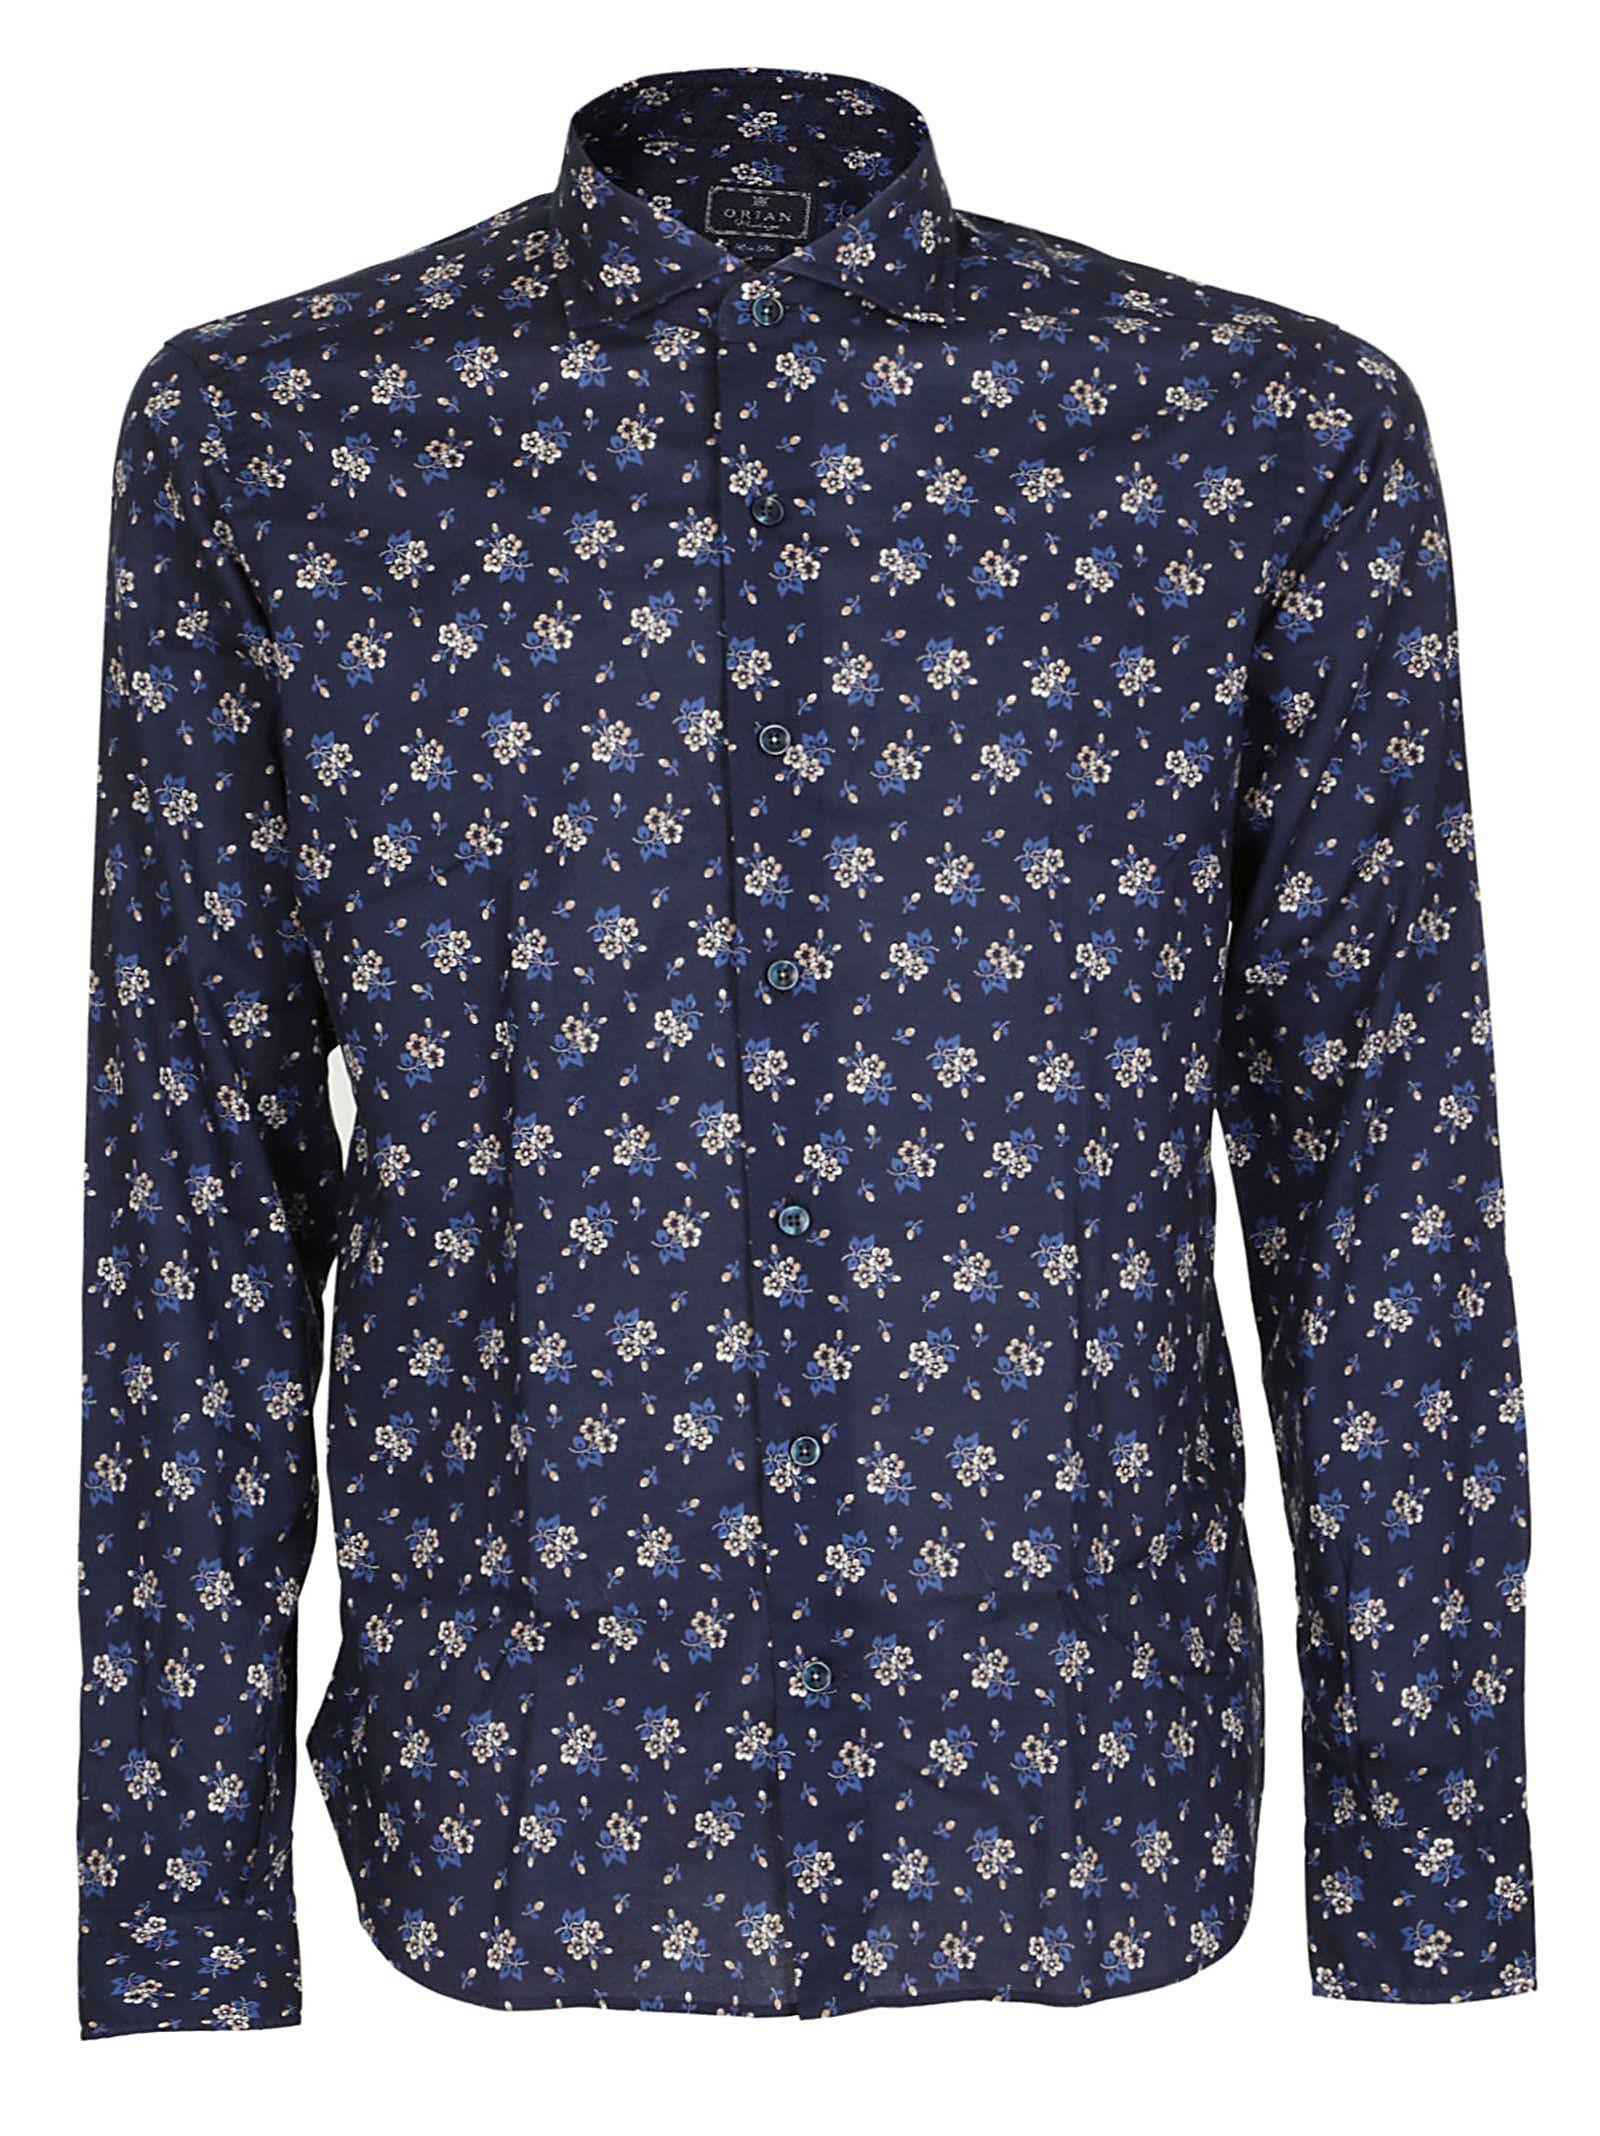 Orian Floral Printed Shirt